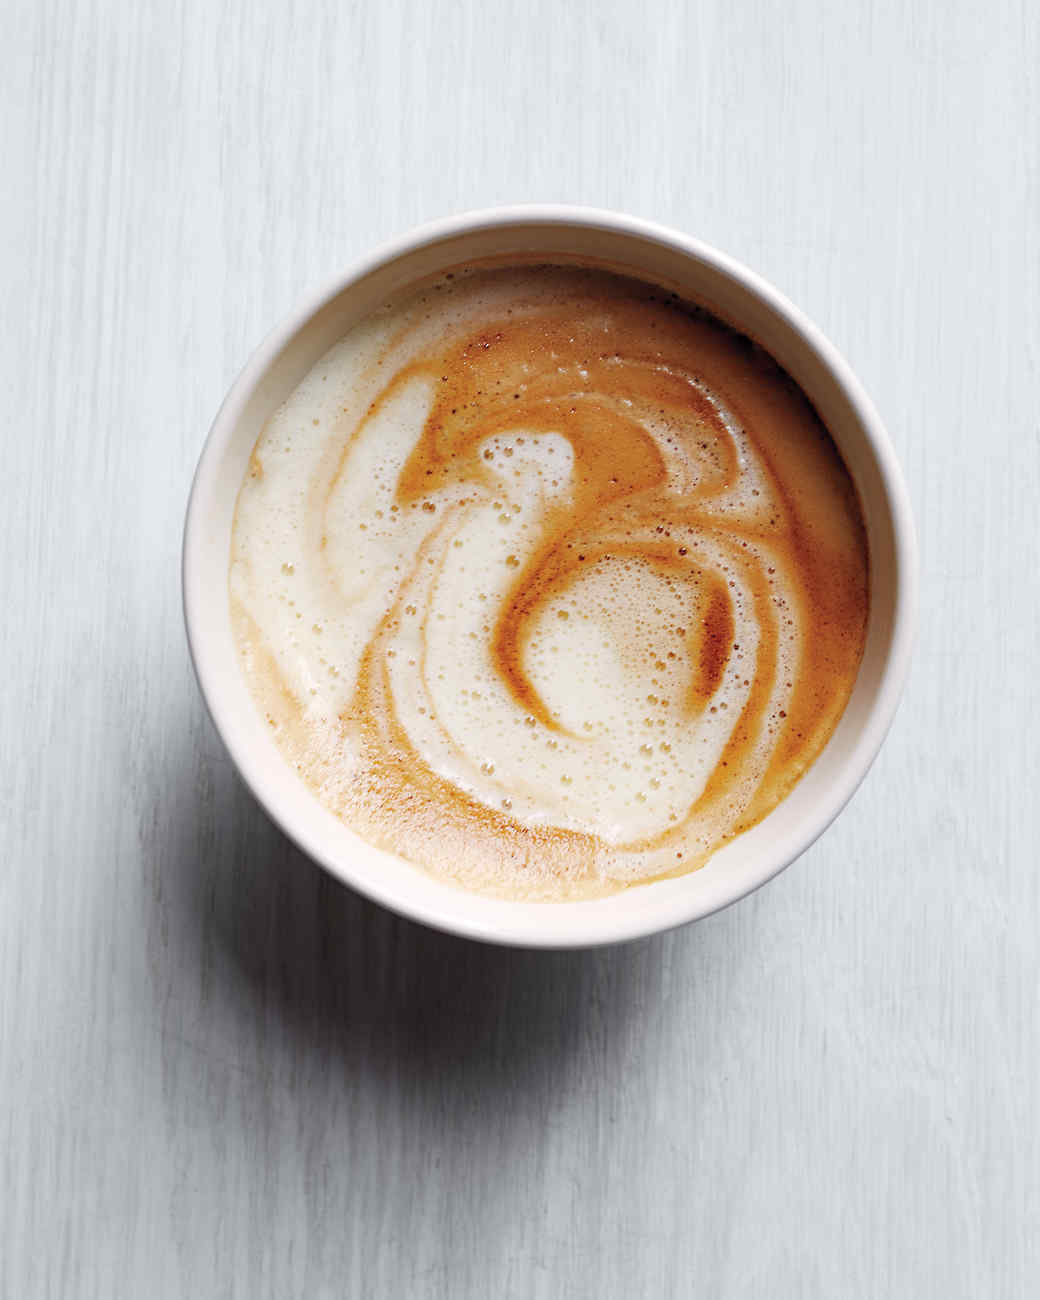 eggnog-latte-011-d111478.jpg